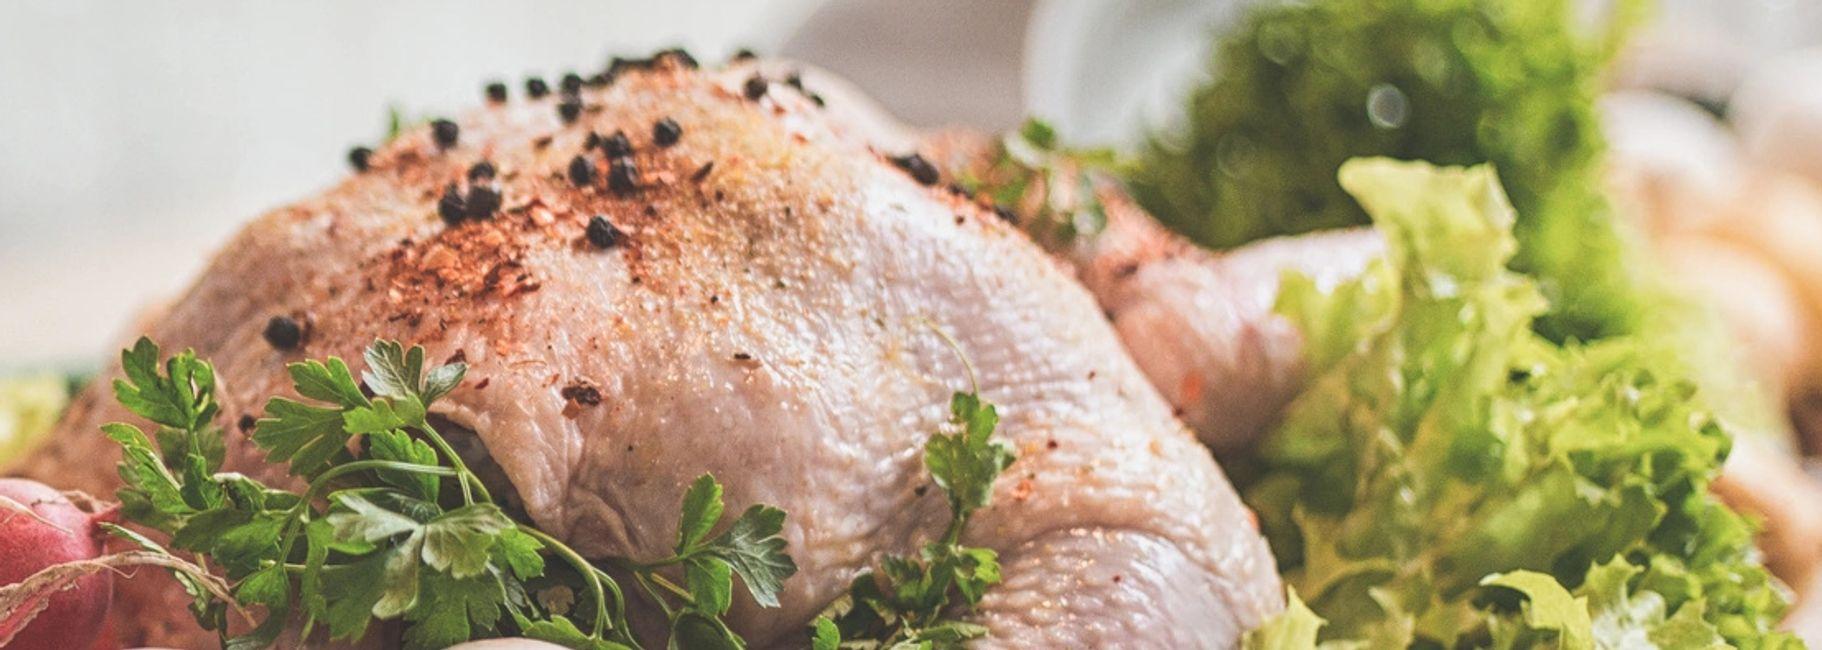 Roast Turkey with Cider Gravy